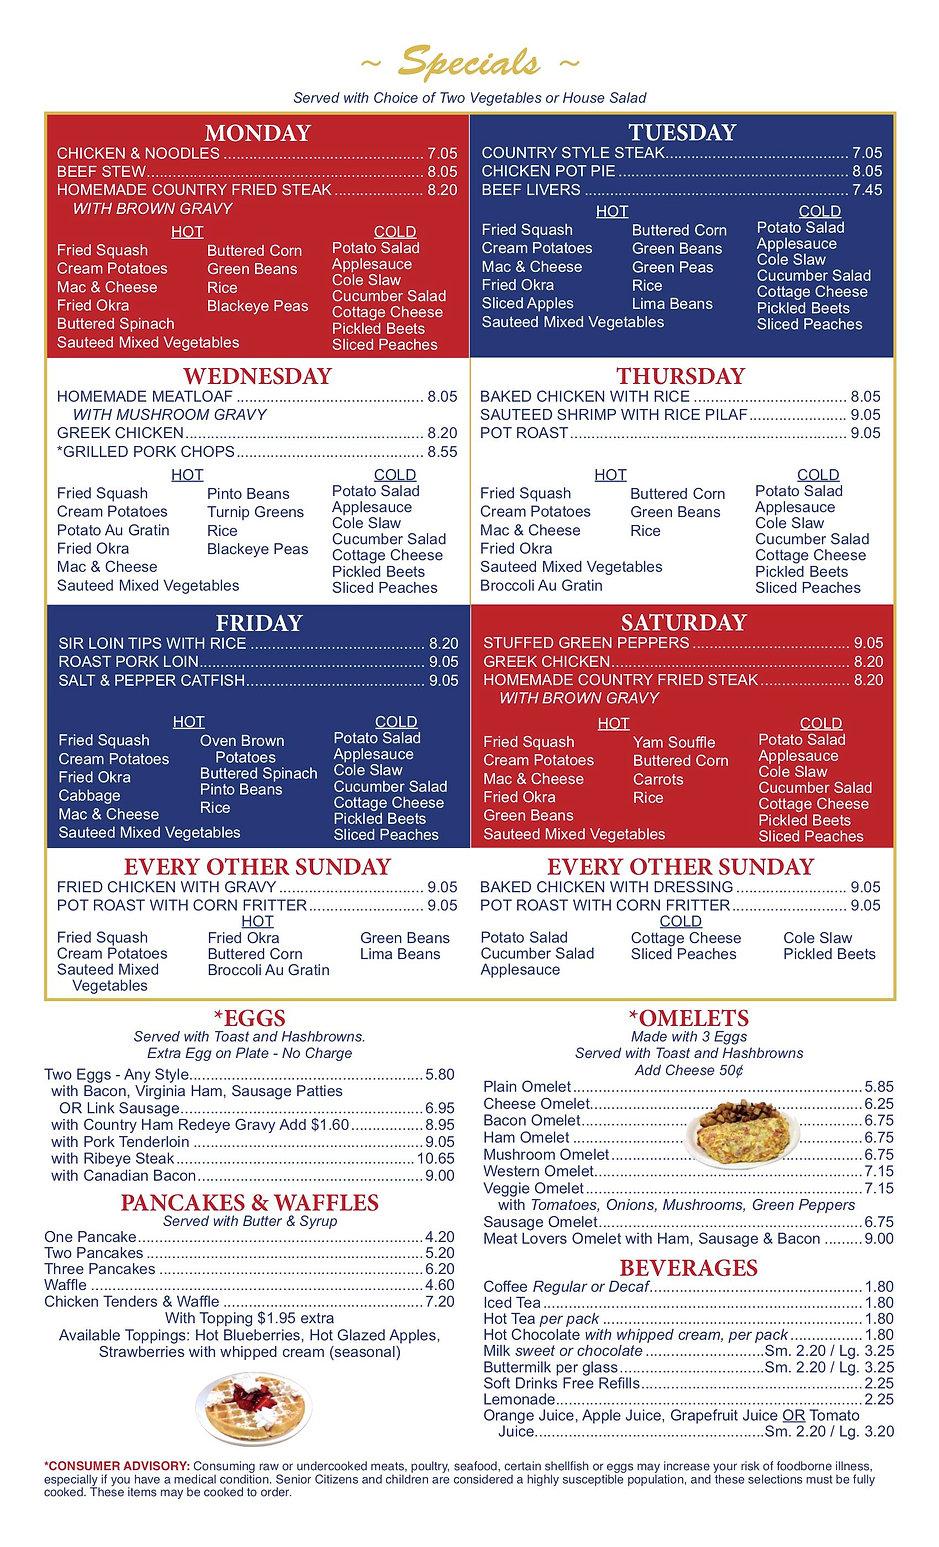 Clemmons Kitchen menu 20214.jpg